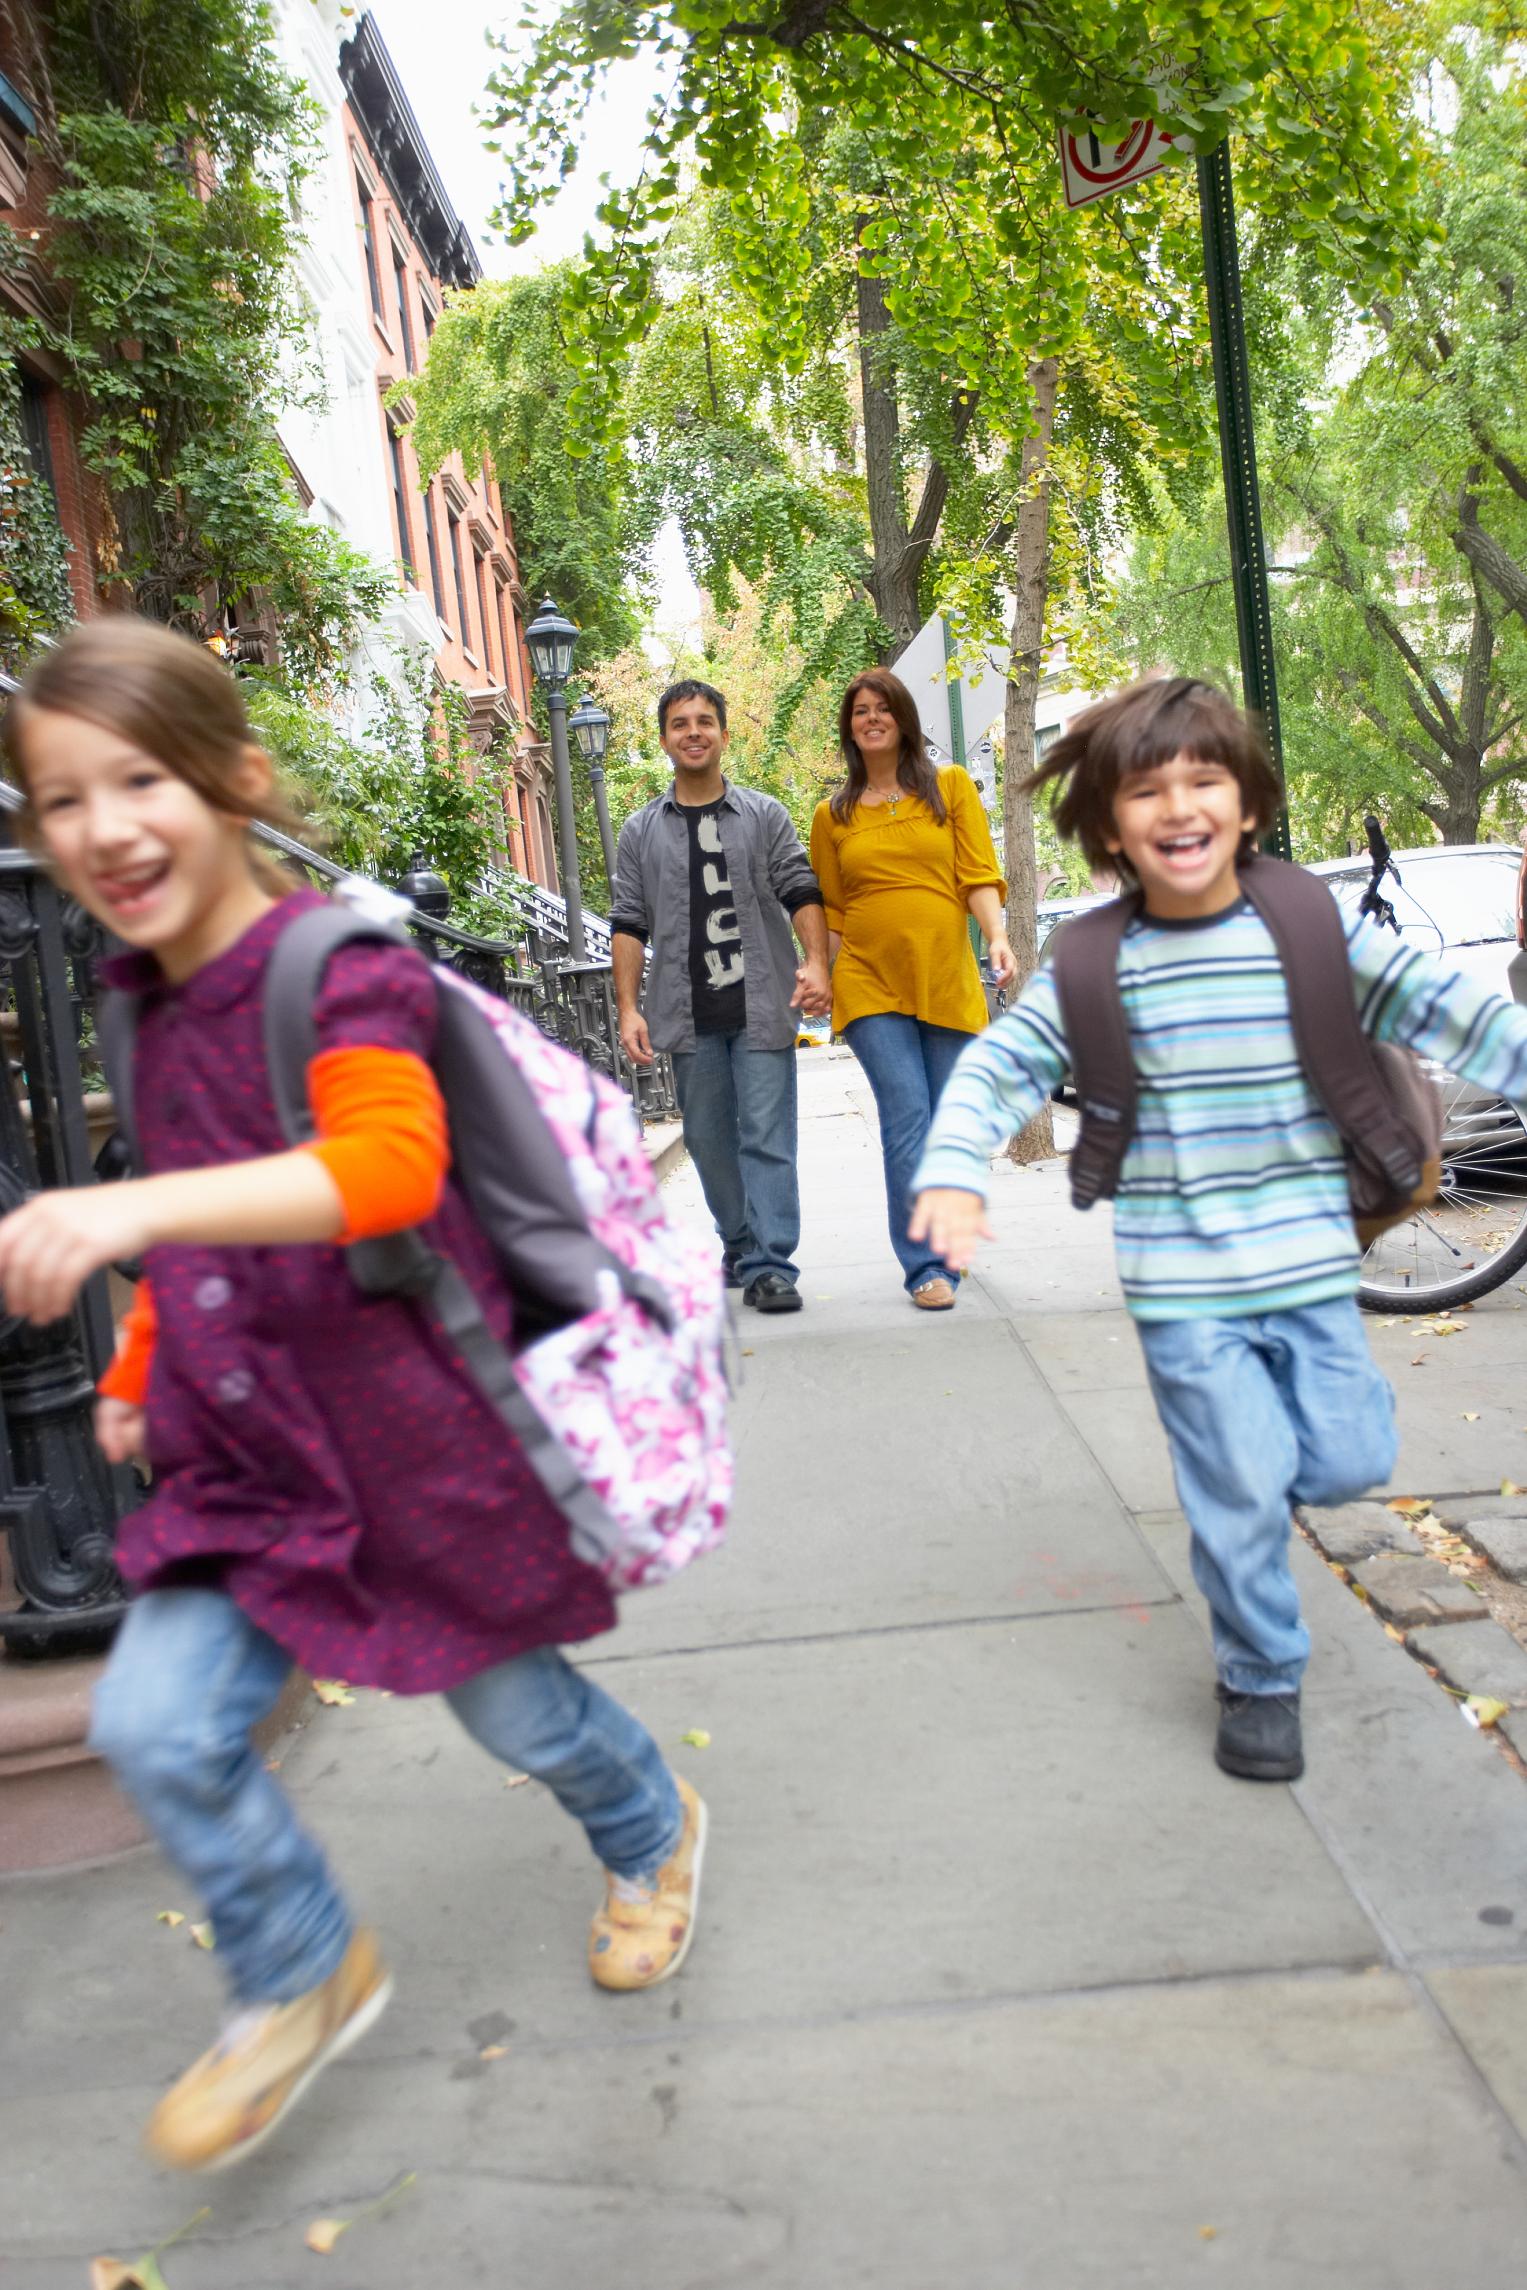 Activities to increase attention span in preschoolers